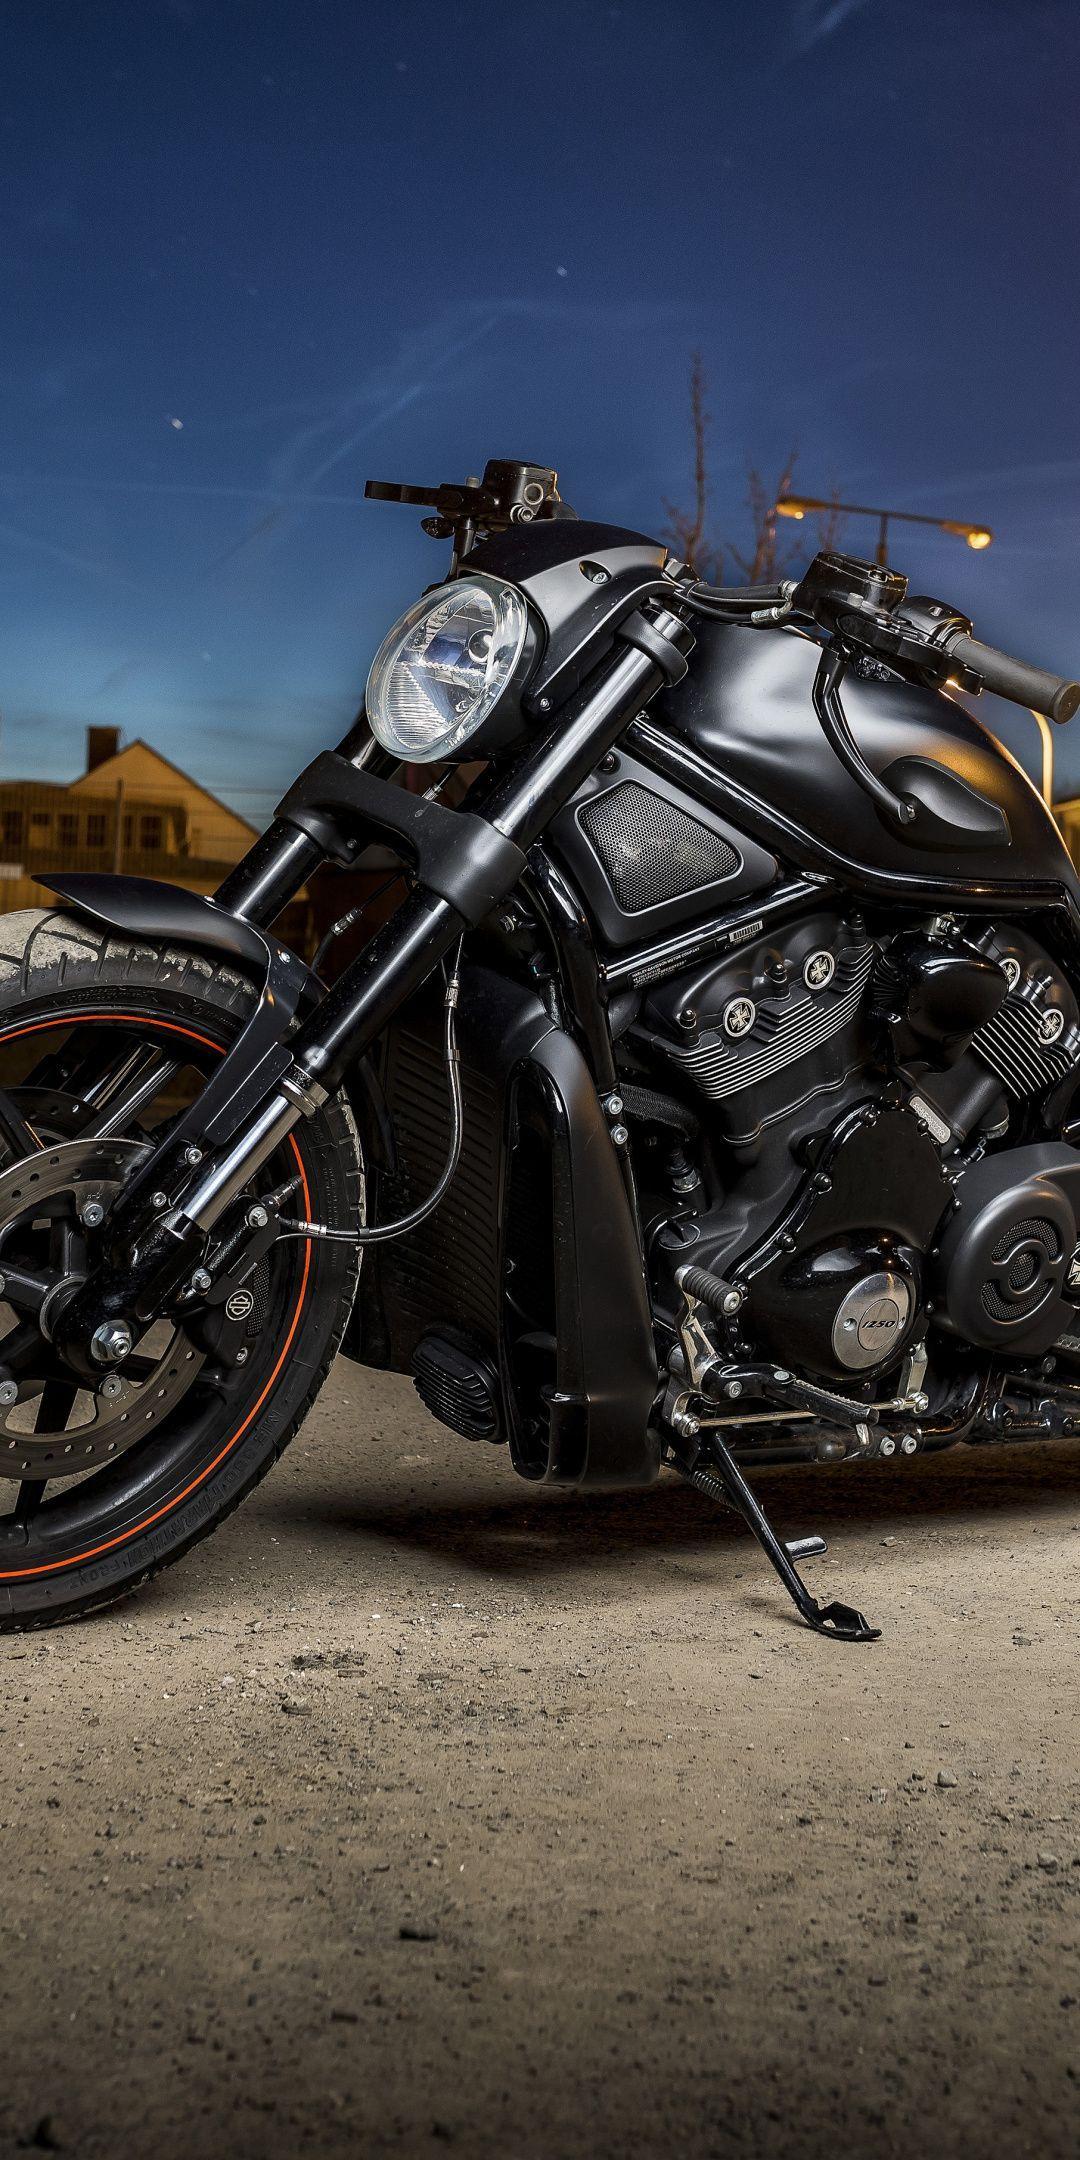 Harley Davidson Muscle Bike Night Out 1080x2160 Wallpaper